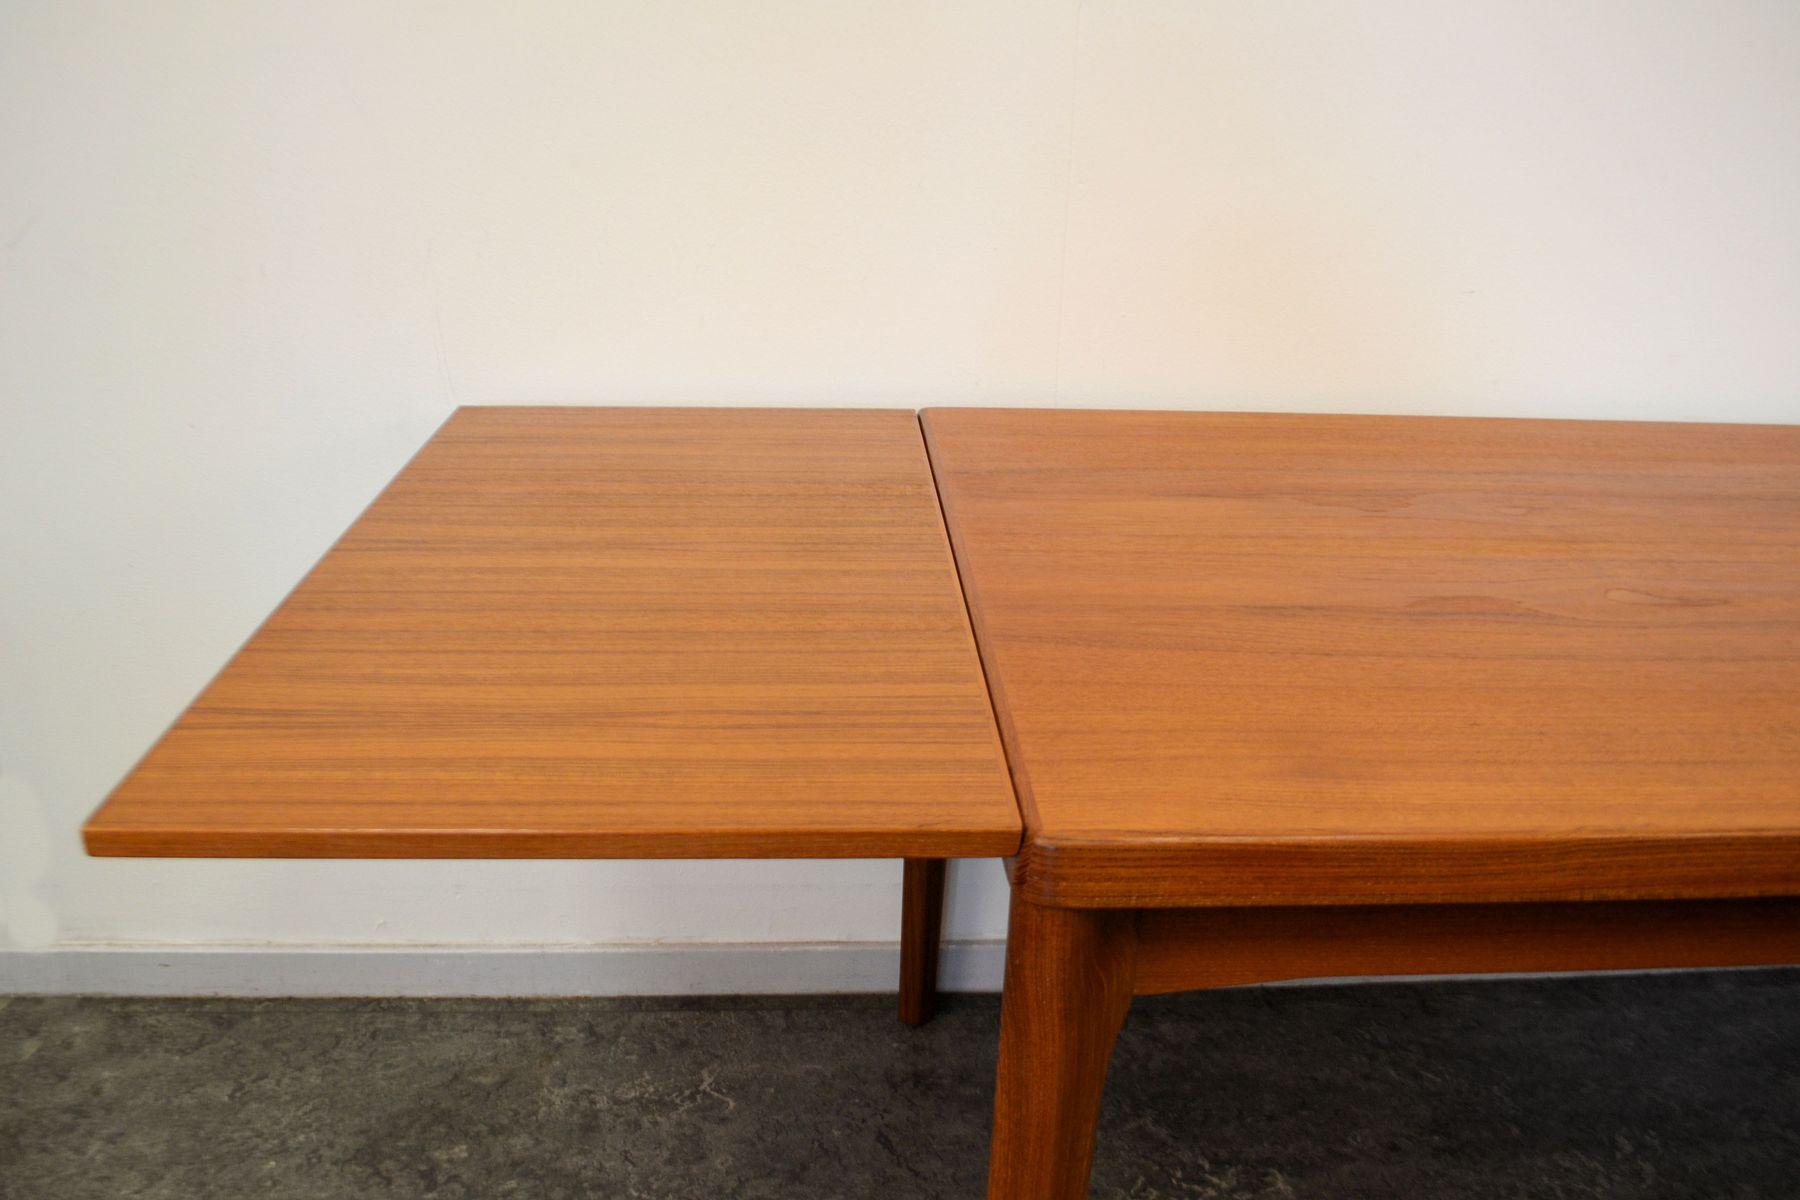 Extendable Teak Dining Table by Henning Kjearnulff for  : extendable teak dining table by henning kjearnulff for velje mobelfabrik 5 from www.pamono.ca size 1800 x 1200 jpeg 114kB